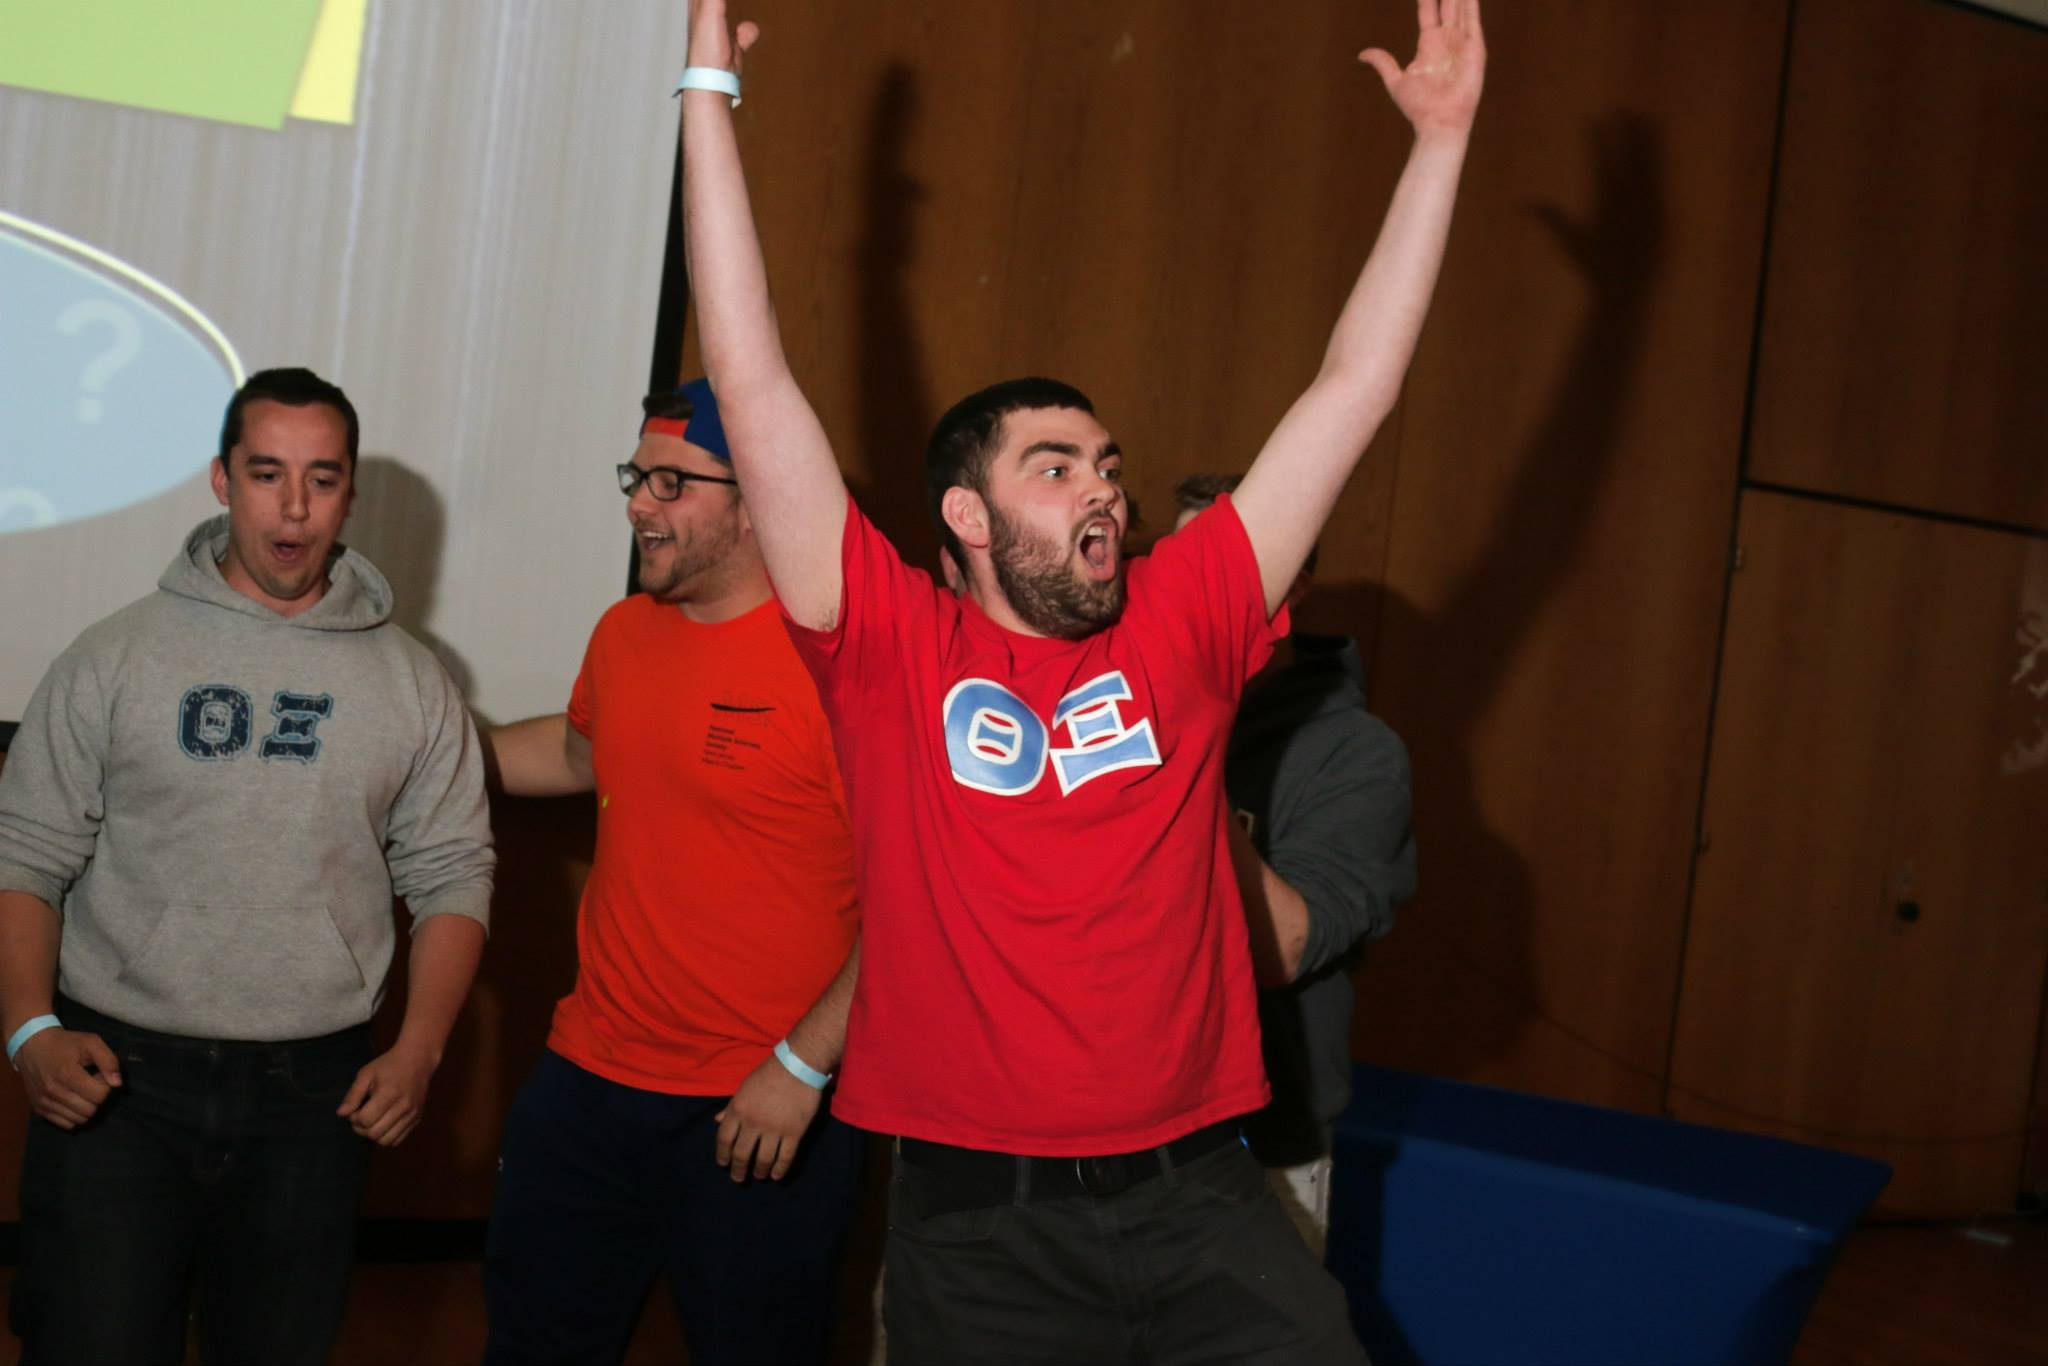 Game Night For Greek Week At Montclair State University